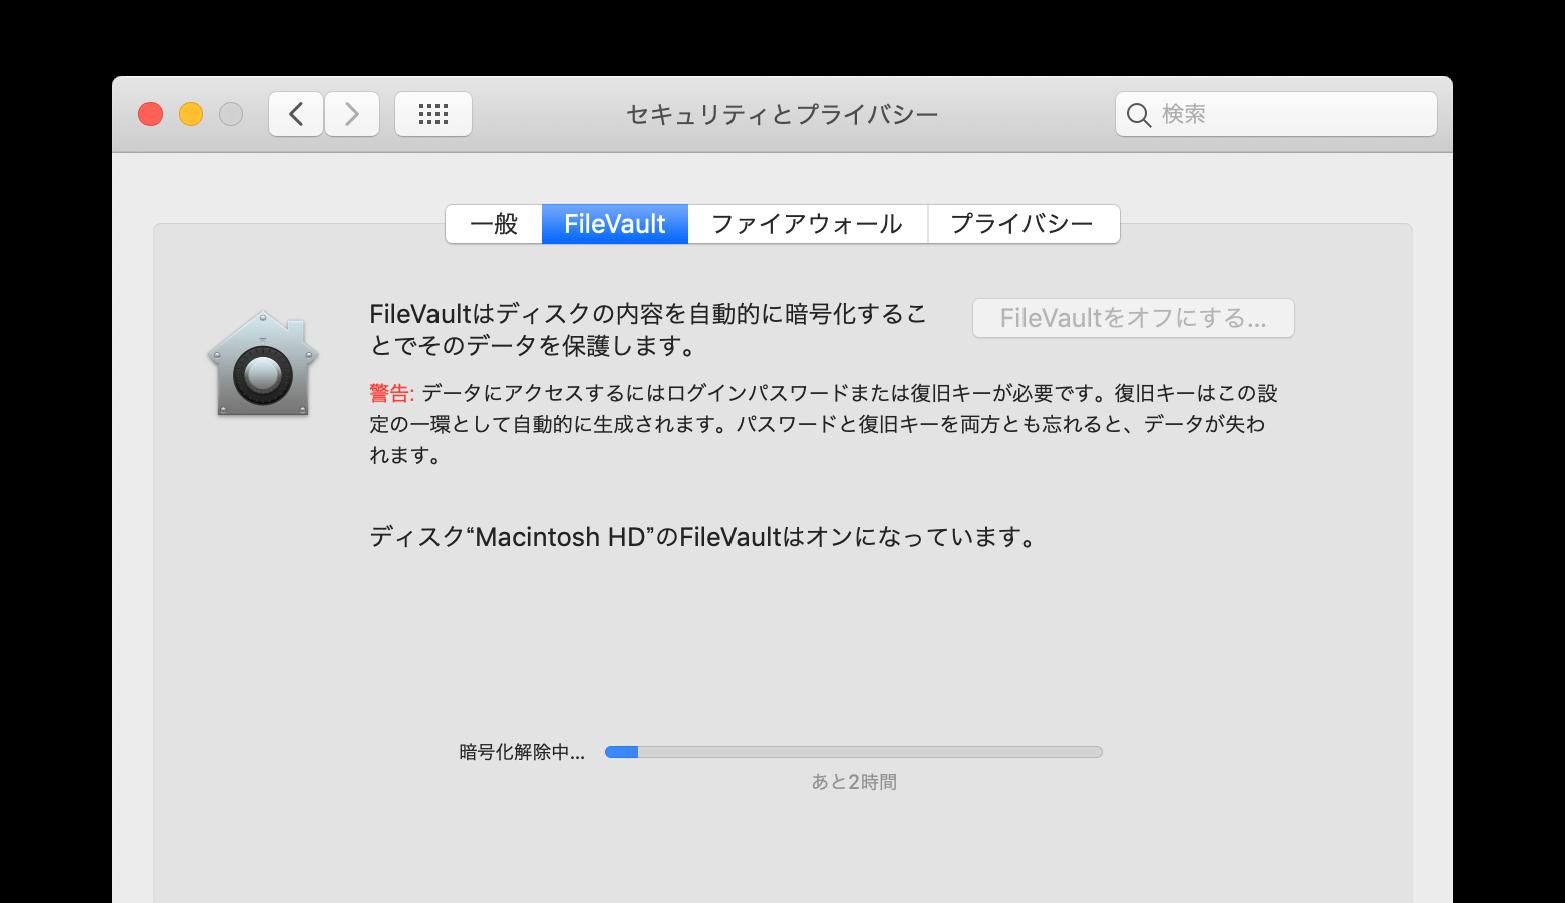 FileVault暗号化解除